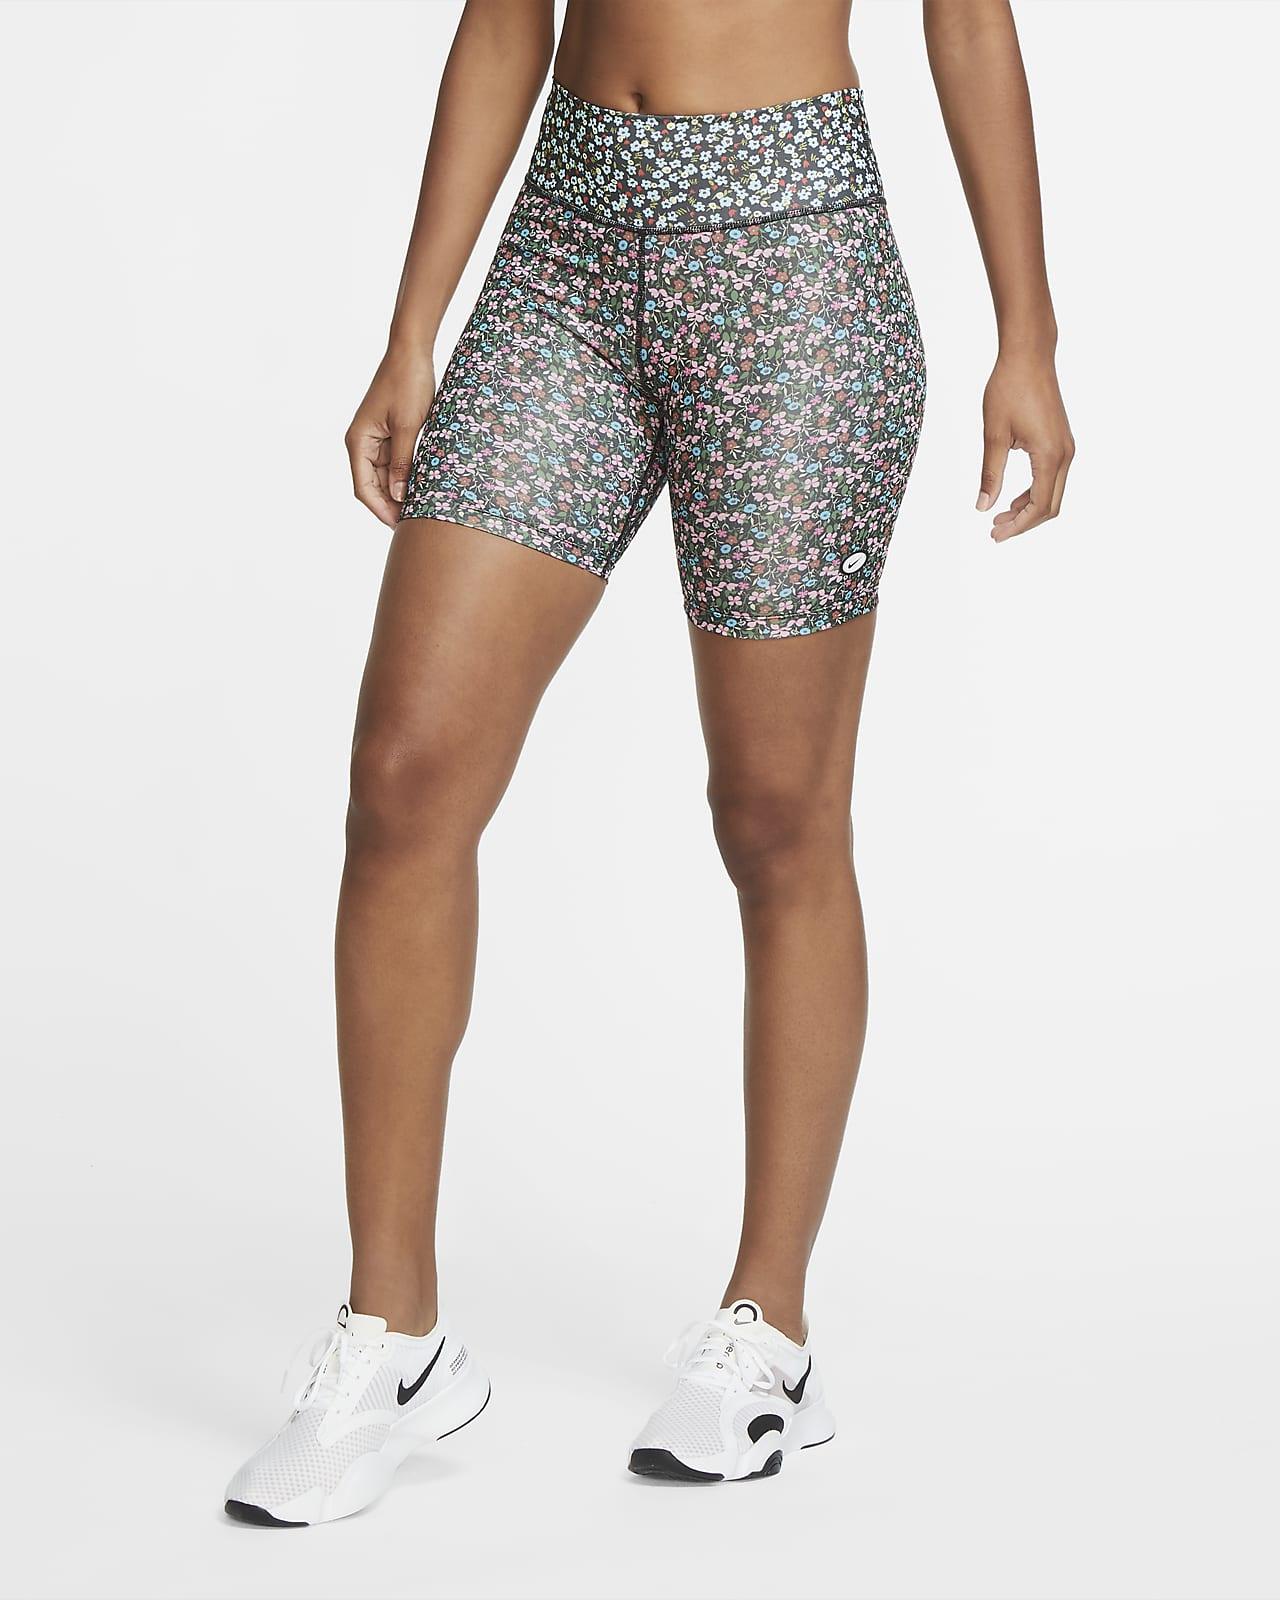 Nike One Women's 18cm (approx.) Shorts